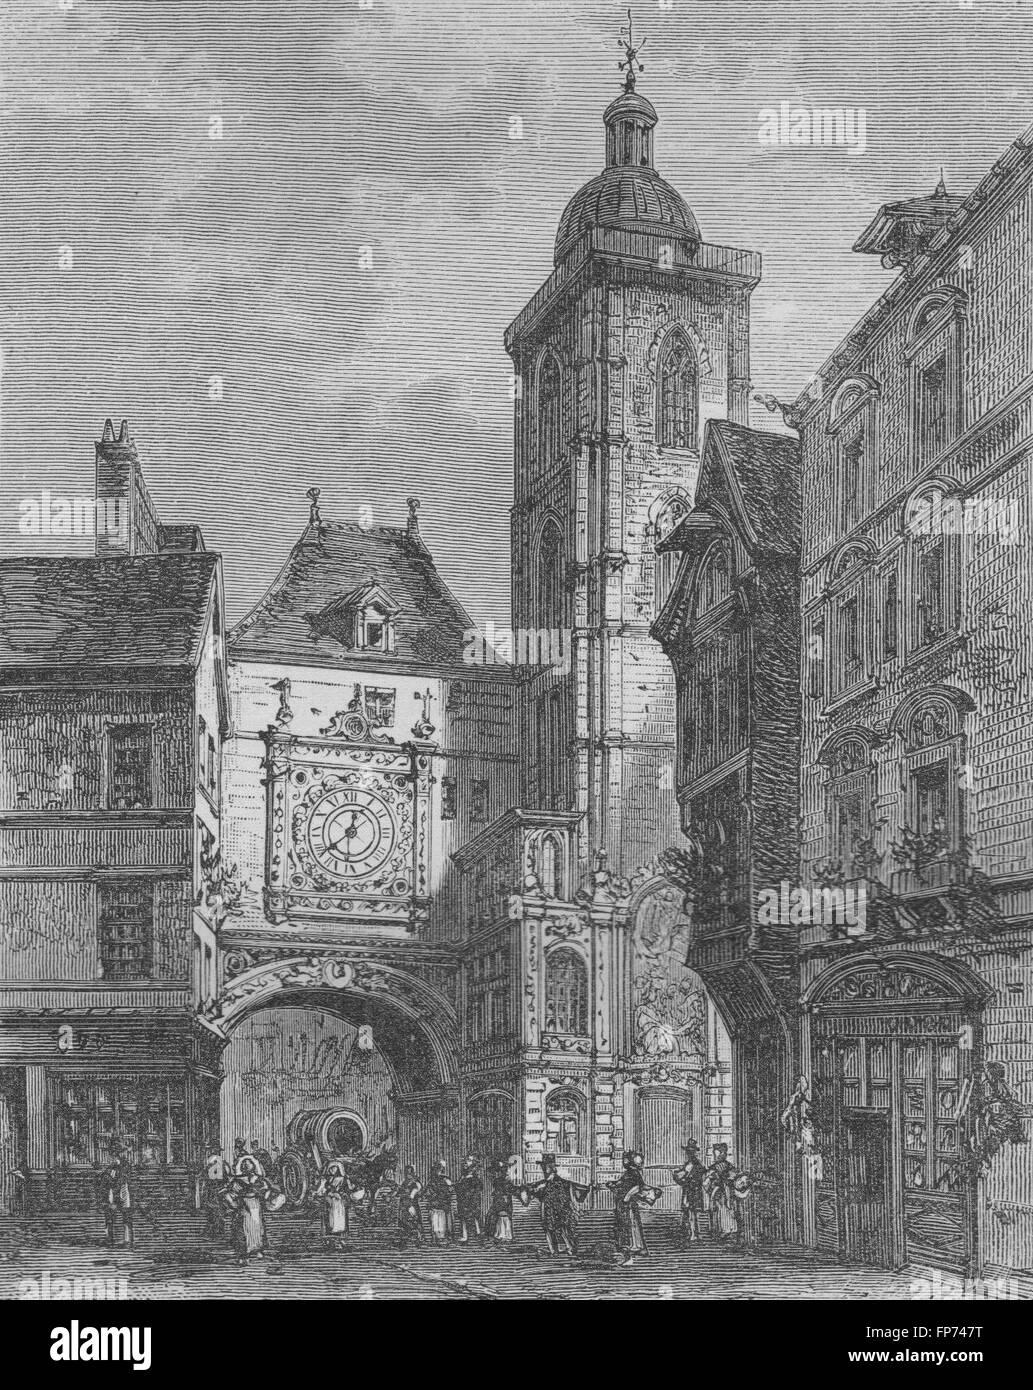 ROUEN: Rue de la Grosse Horloge, antique print 1882 - Stock Image